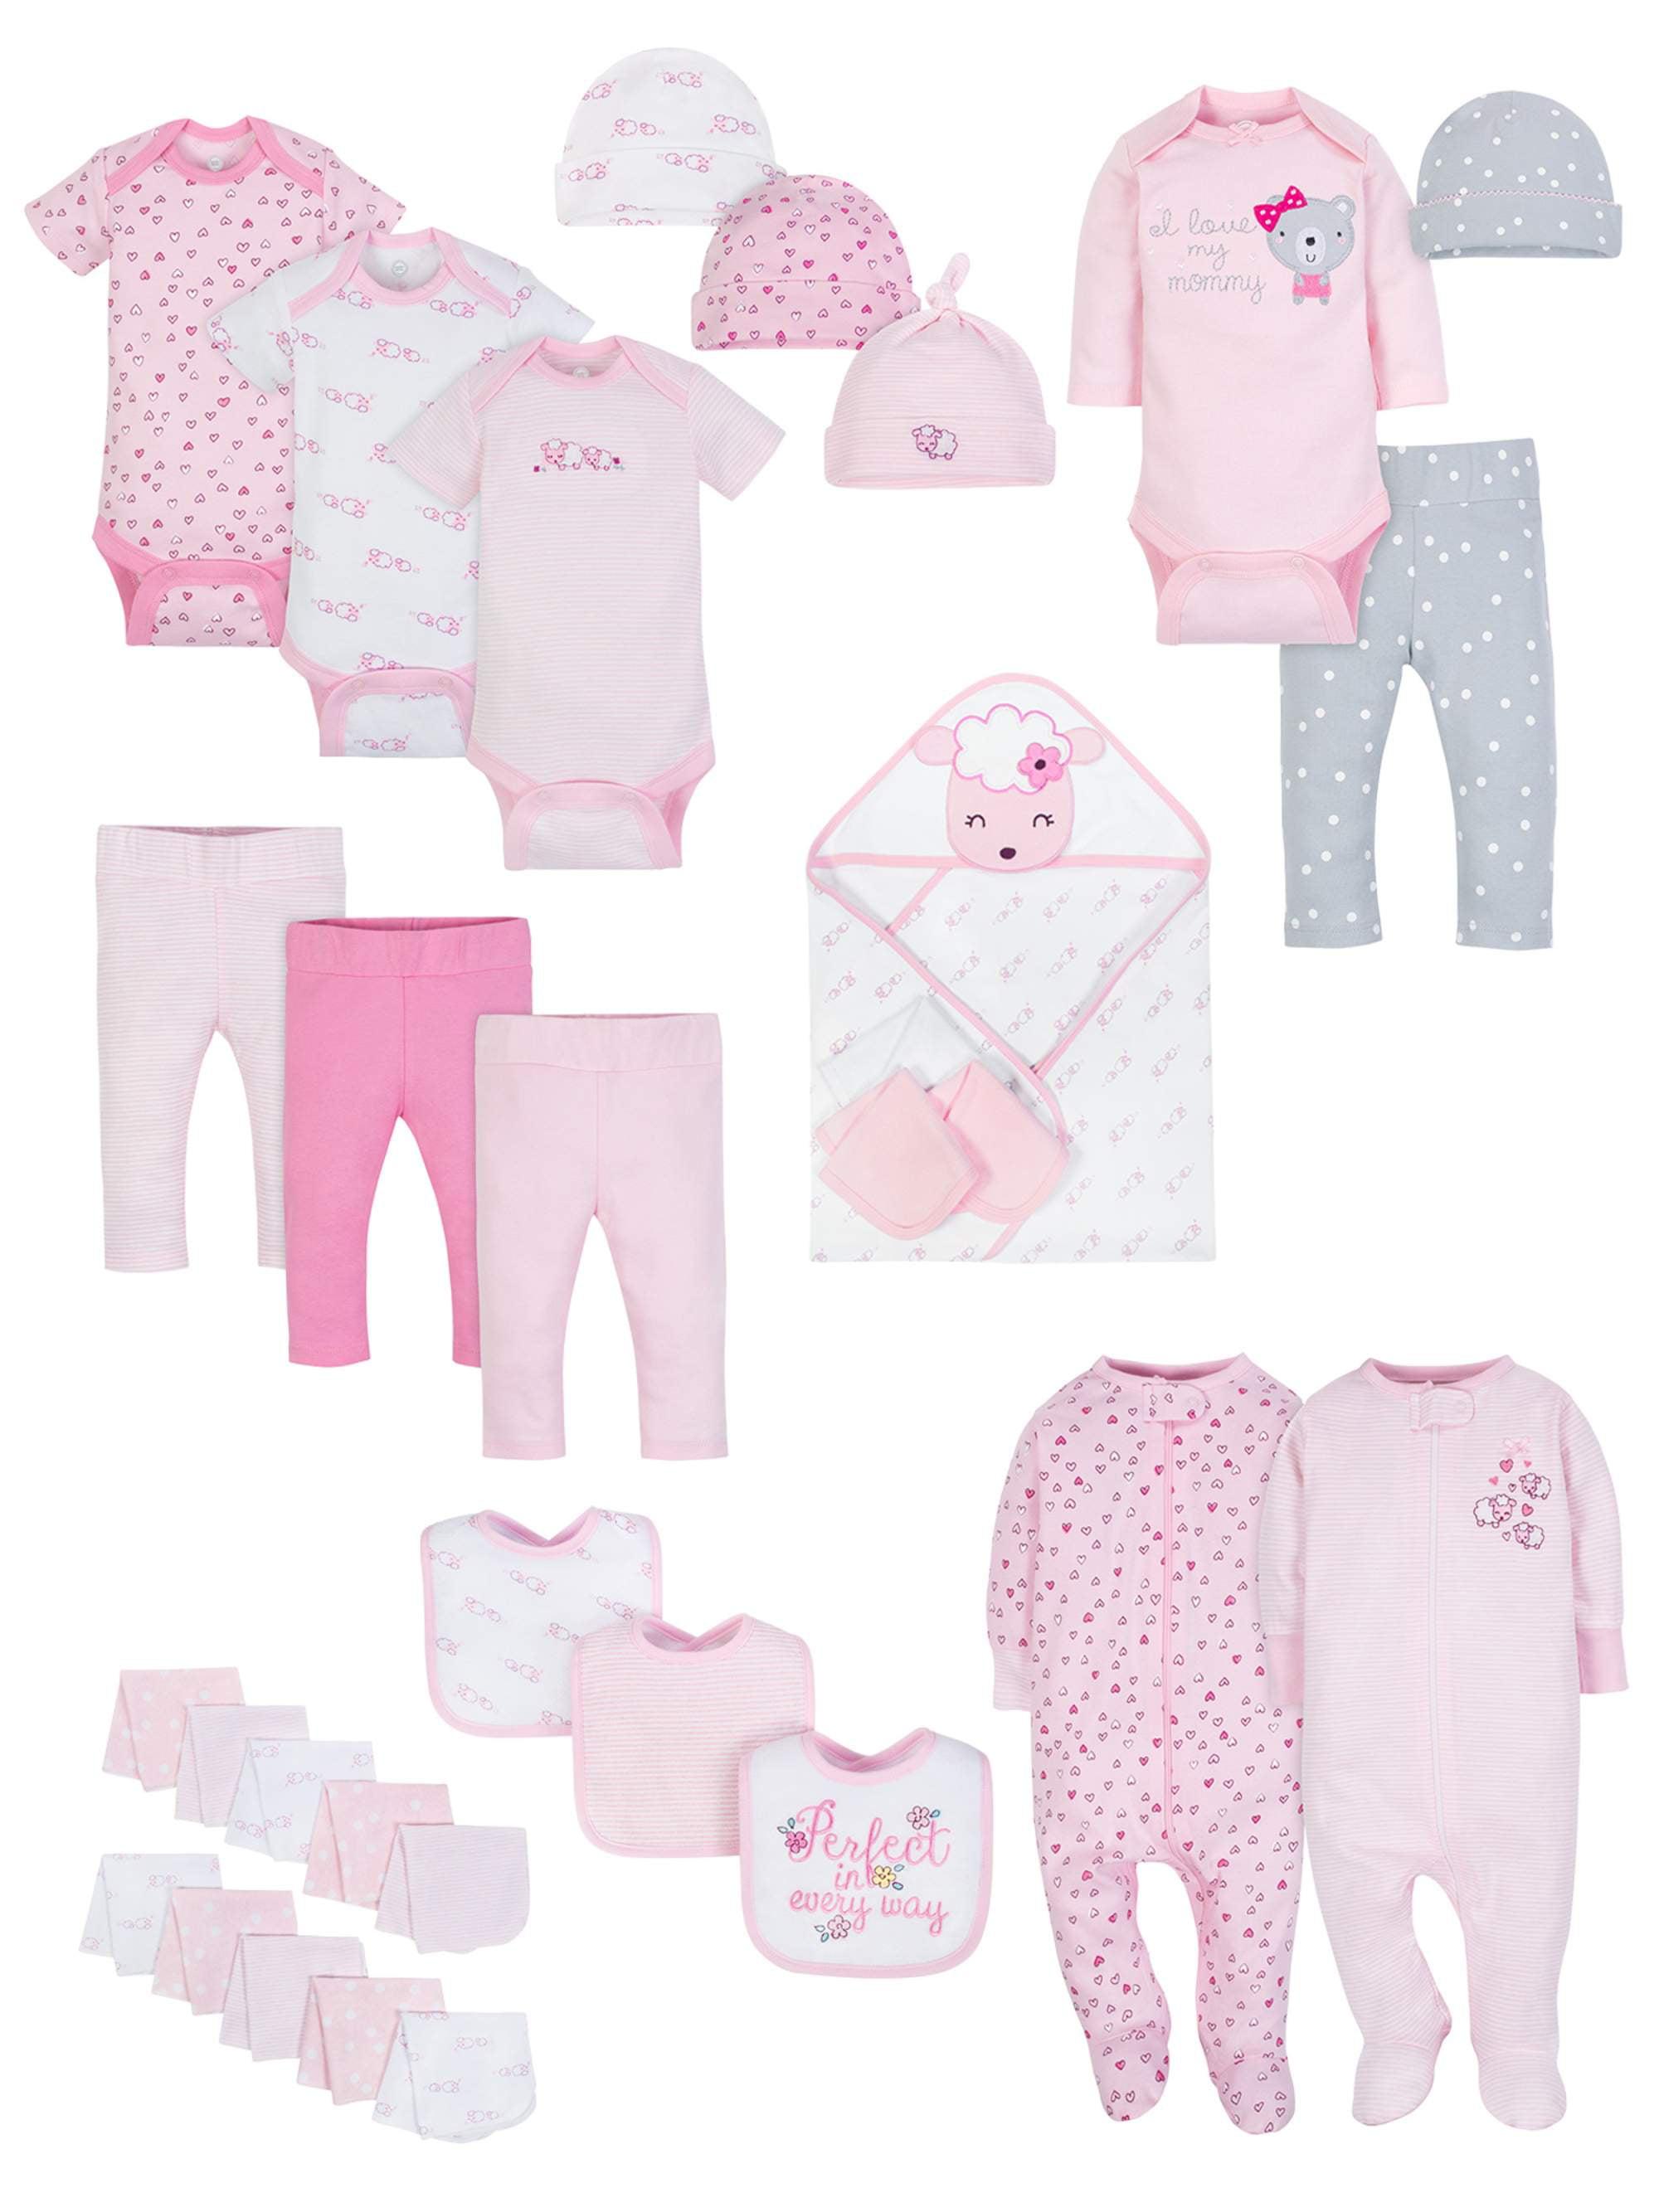 Baby Shower Layette Gift Set, 31-piece (Baby Girls)